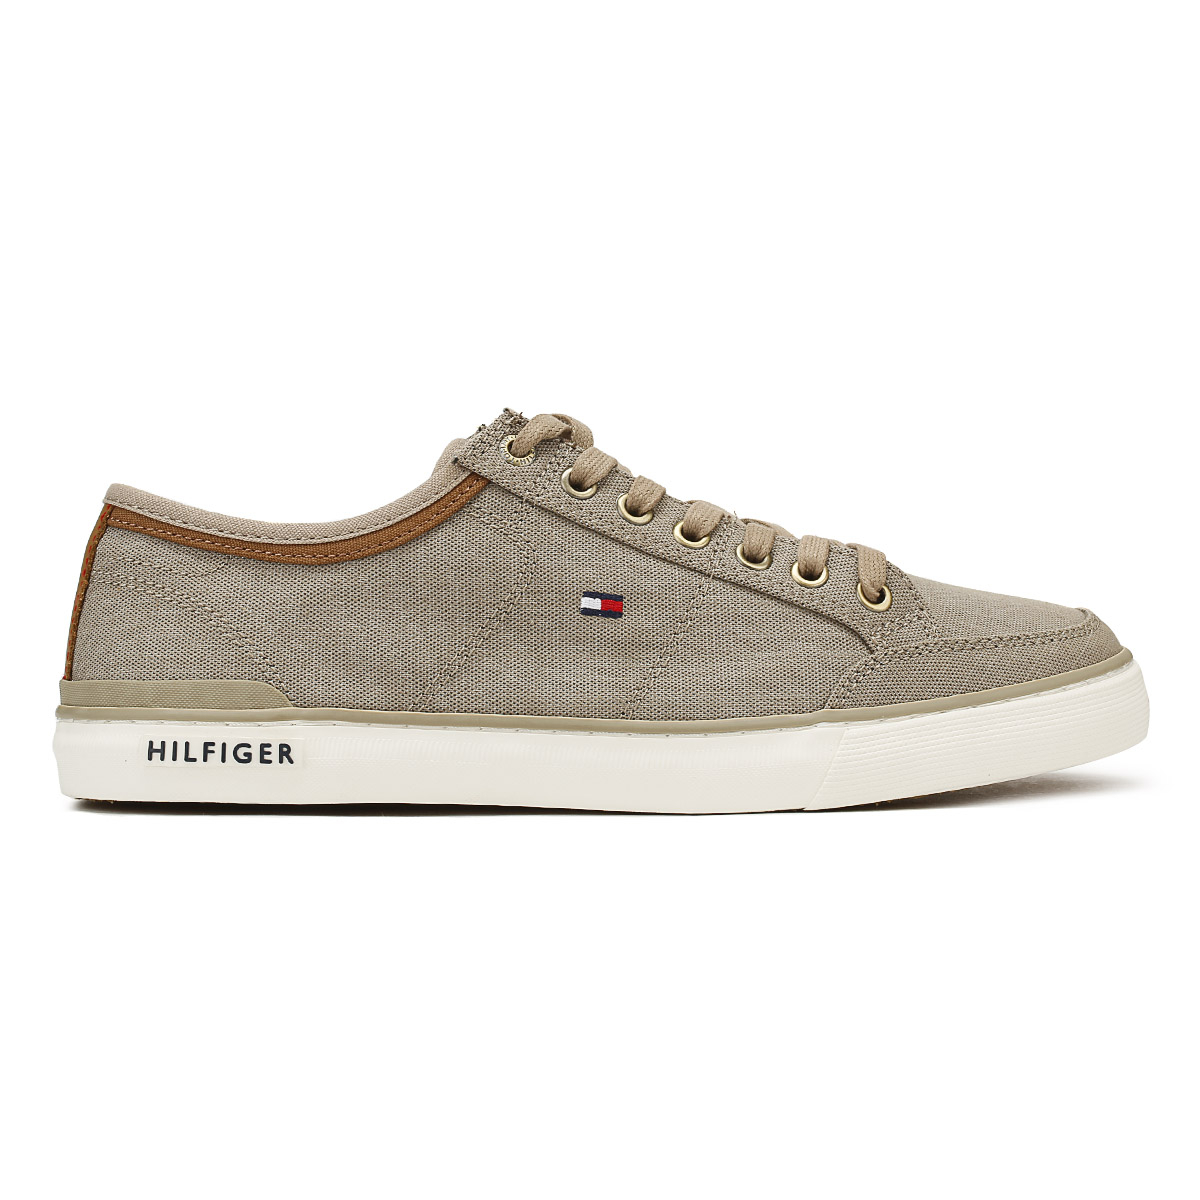 Tommy Hilfiger Mens Textile Trainers Cobblestone Grey Core Lace Up Casual Shoes